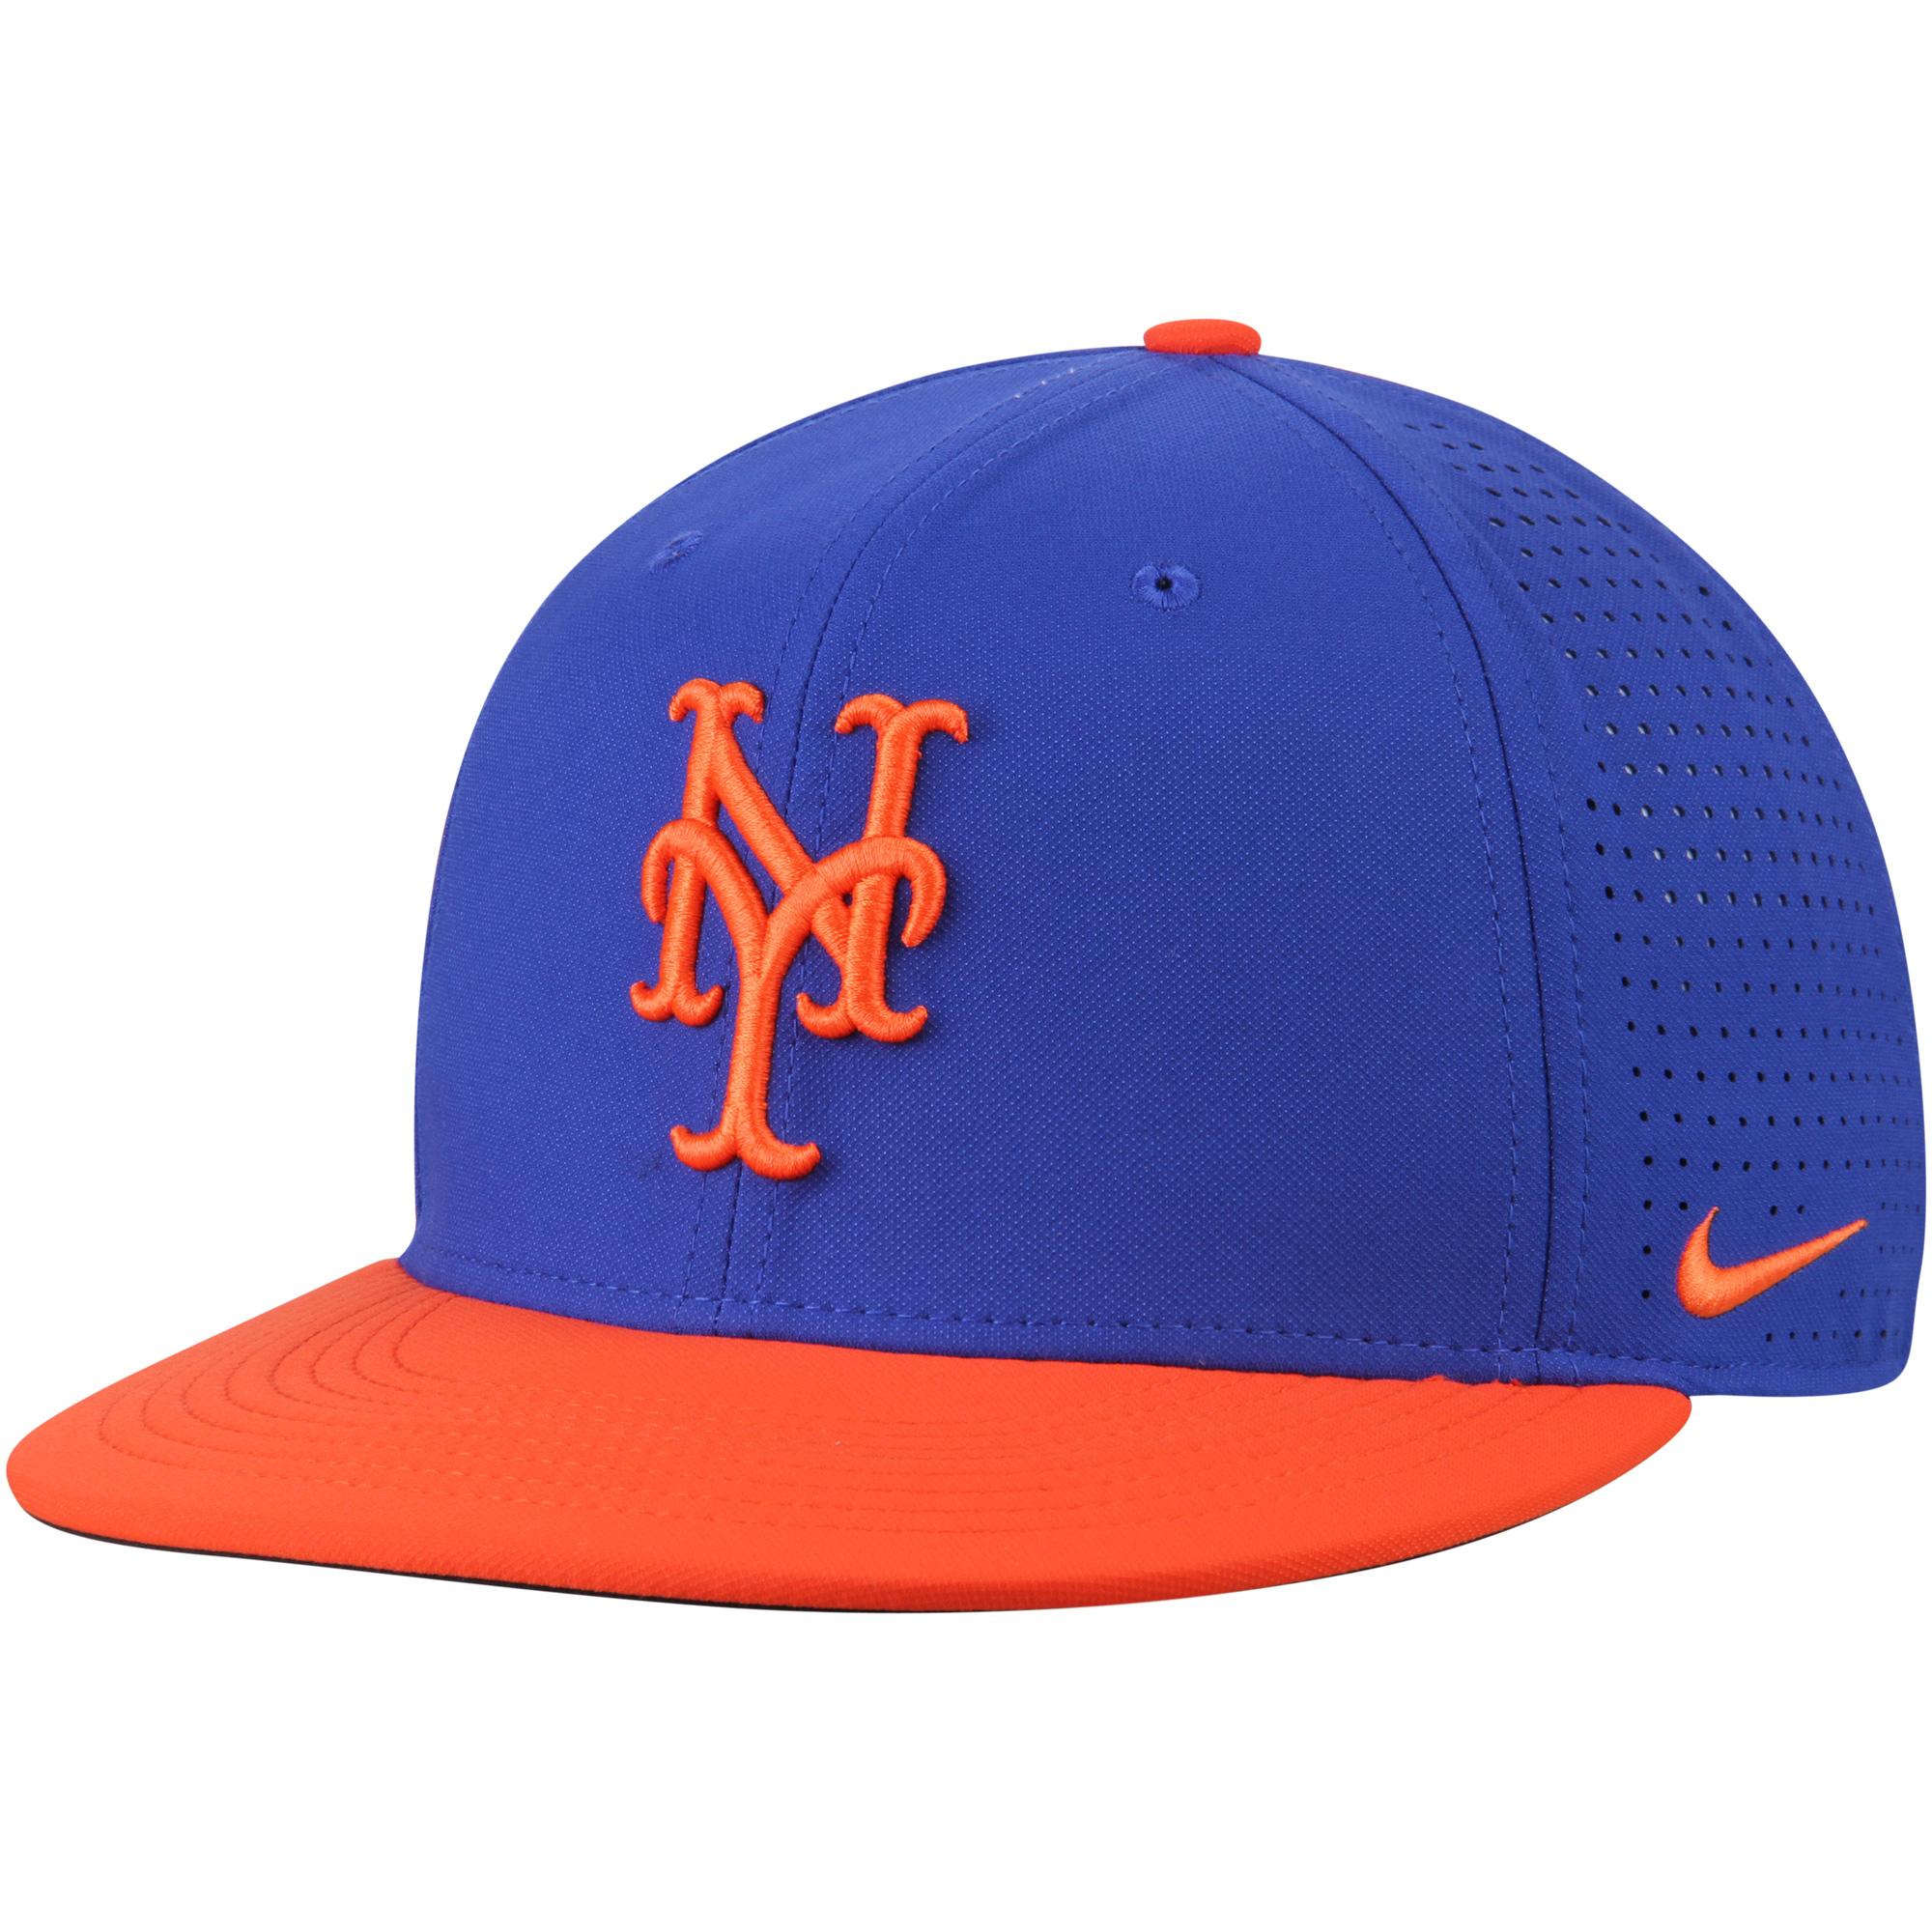 New York Mets Nike Aero True Adjustable Hat - Royal/Orange - OSFA